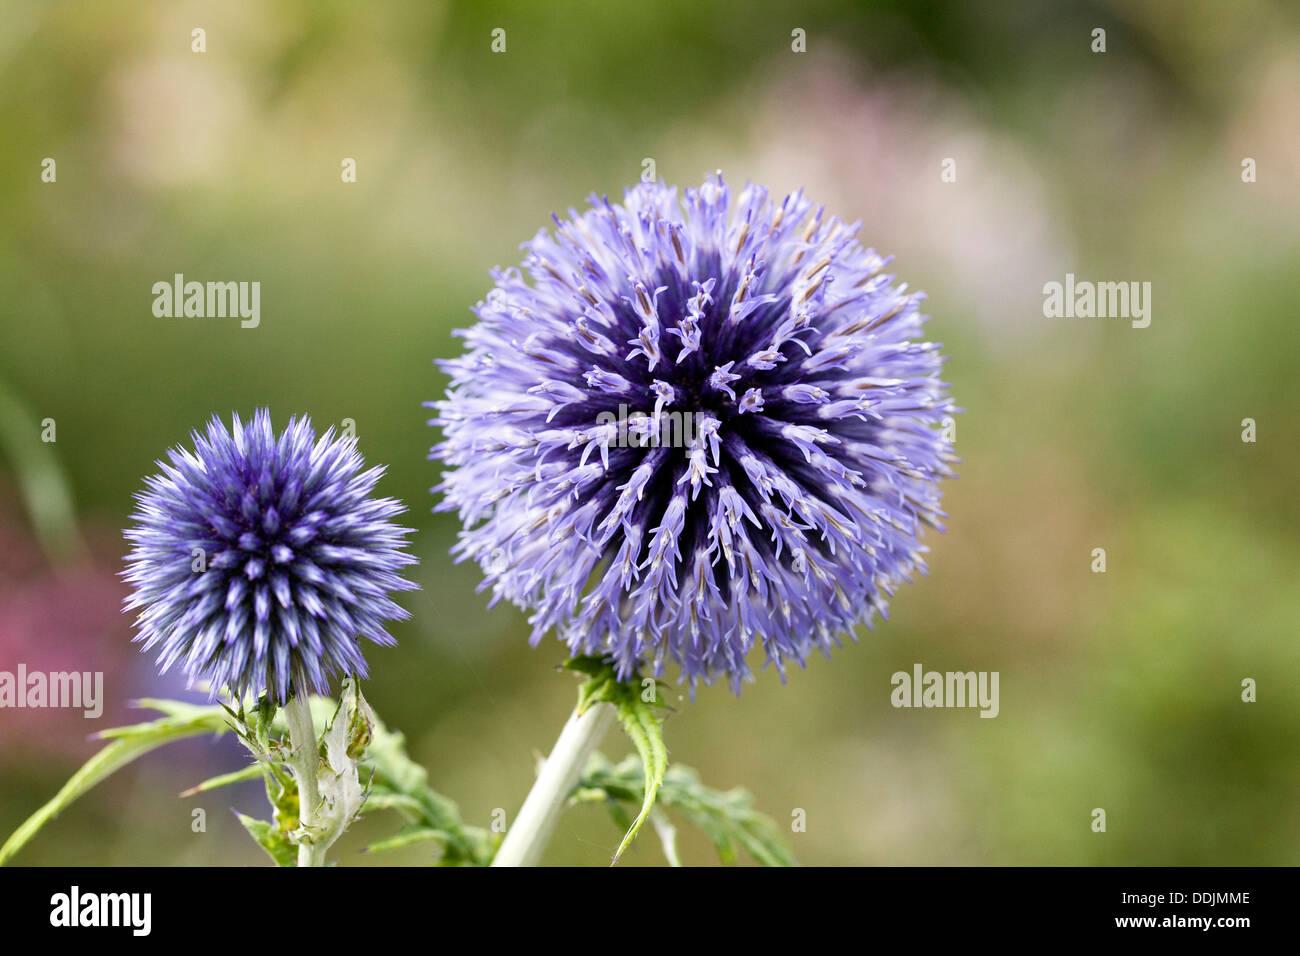 Echinops Bannaticus 'Taplow Blue'. Globe Distel Blume. Stockbild